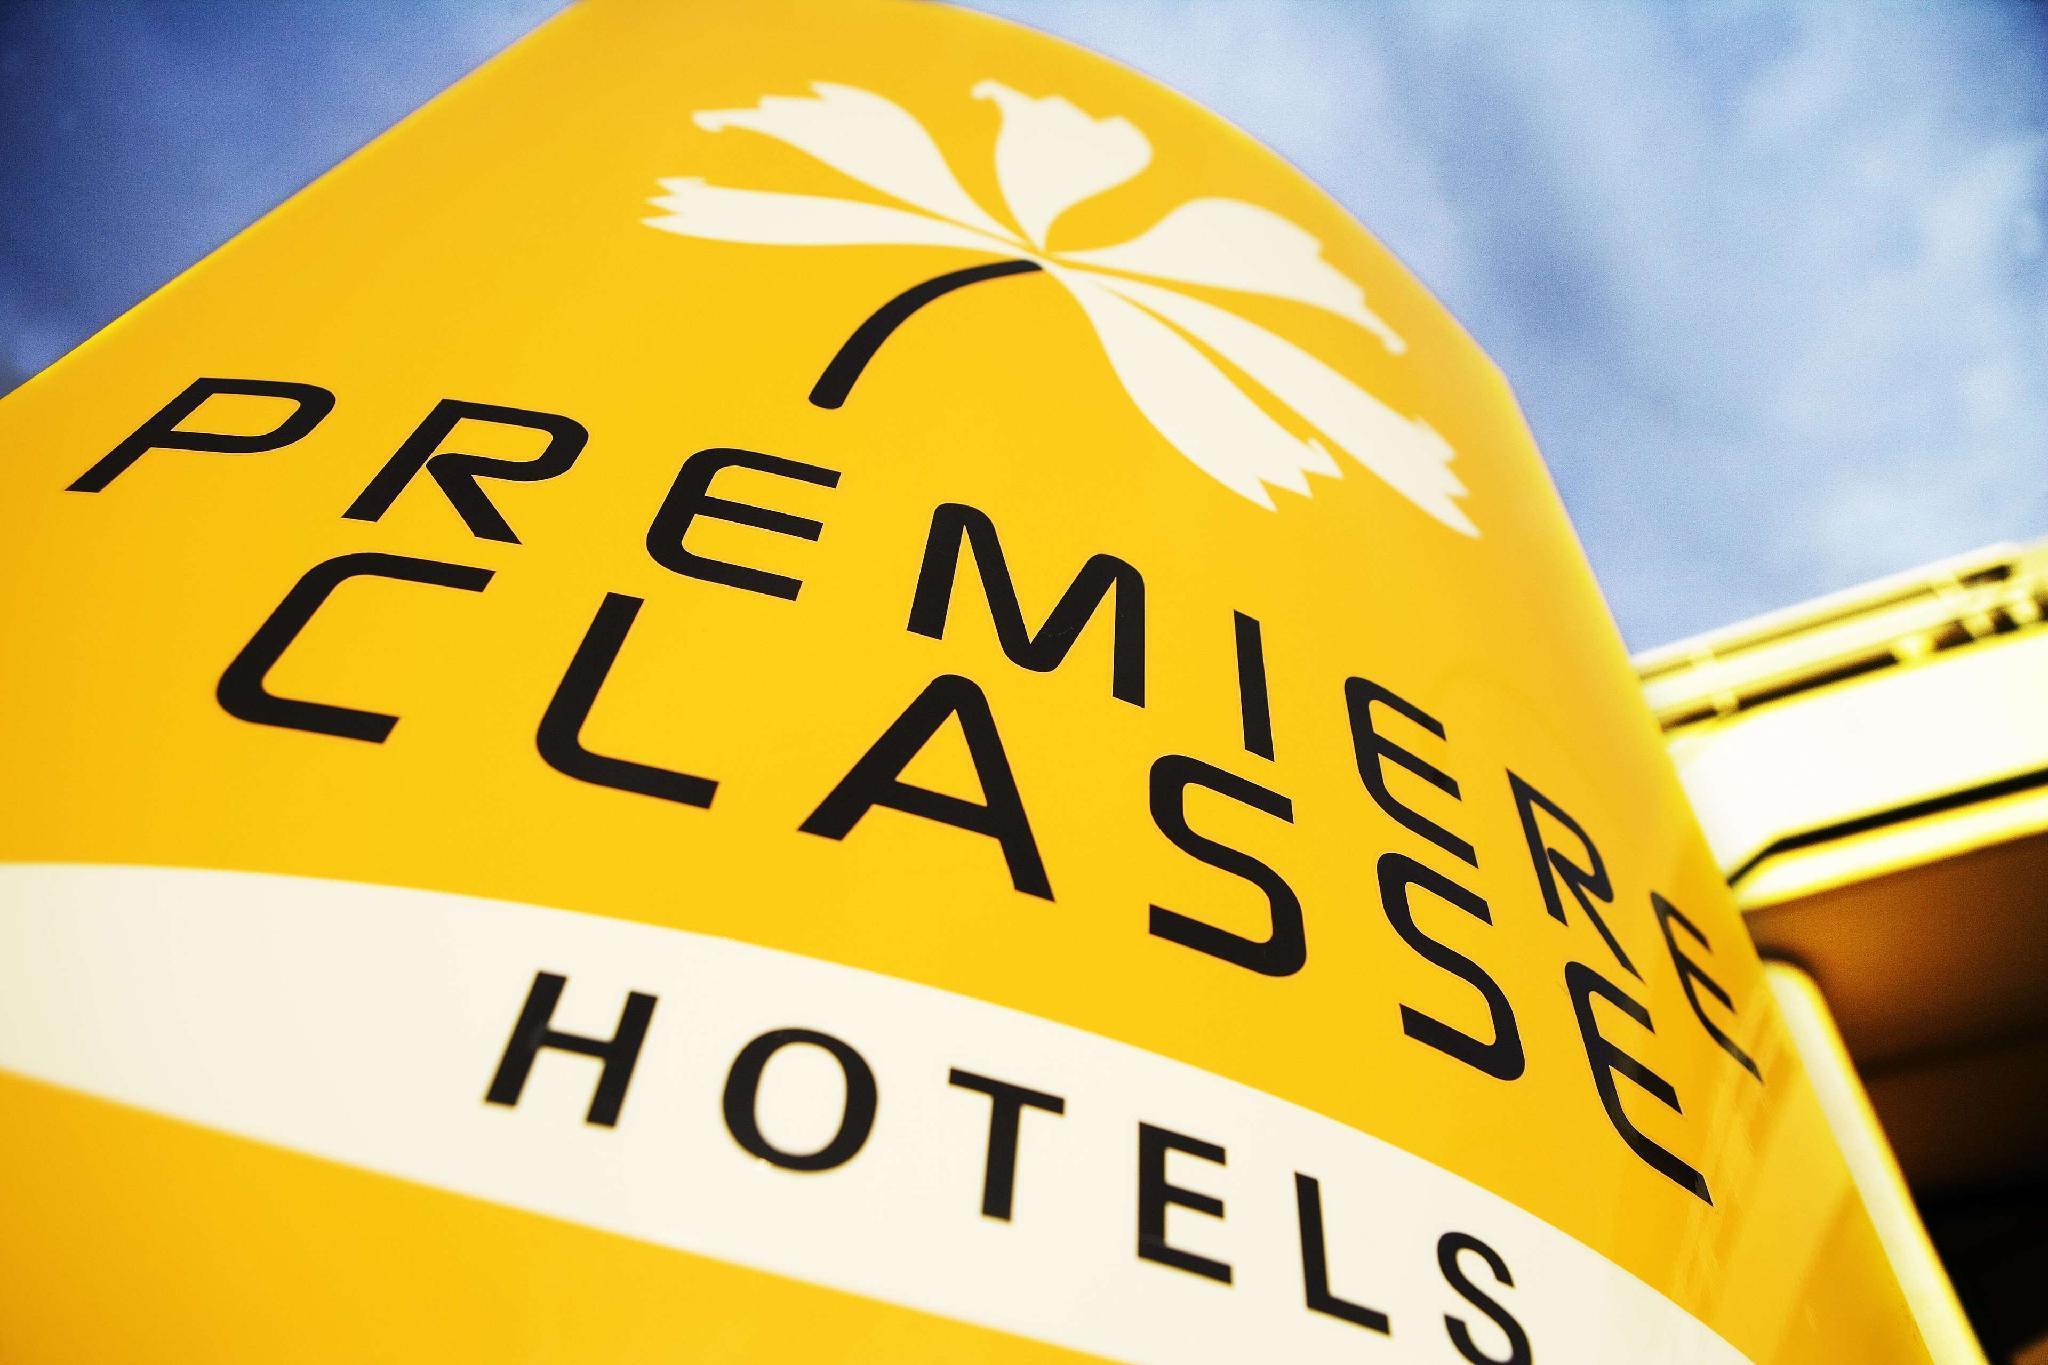 Ma Petite Chaise Nantes hotel de nantes saint herblain | saint-herblain 2020 updated